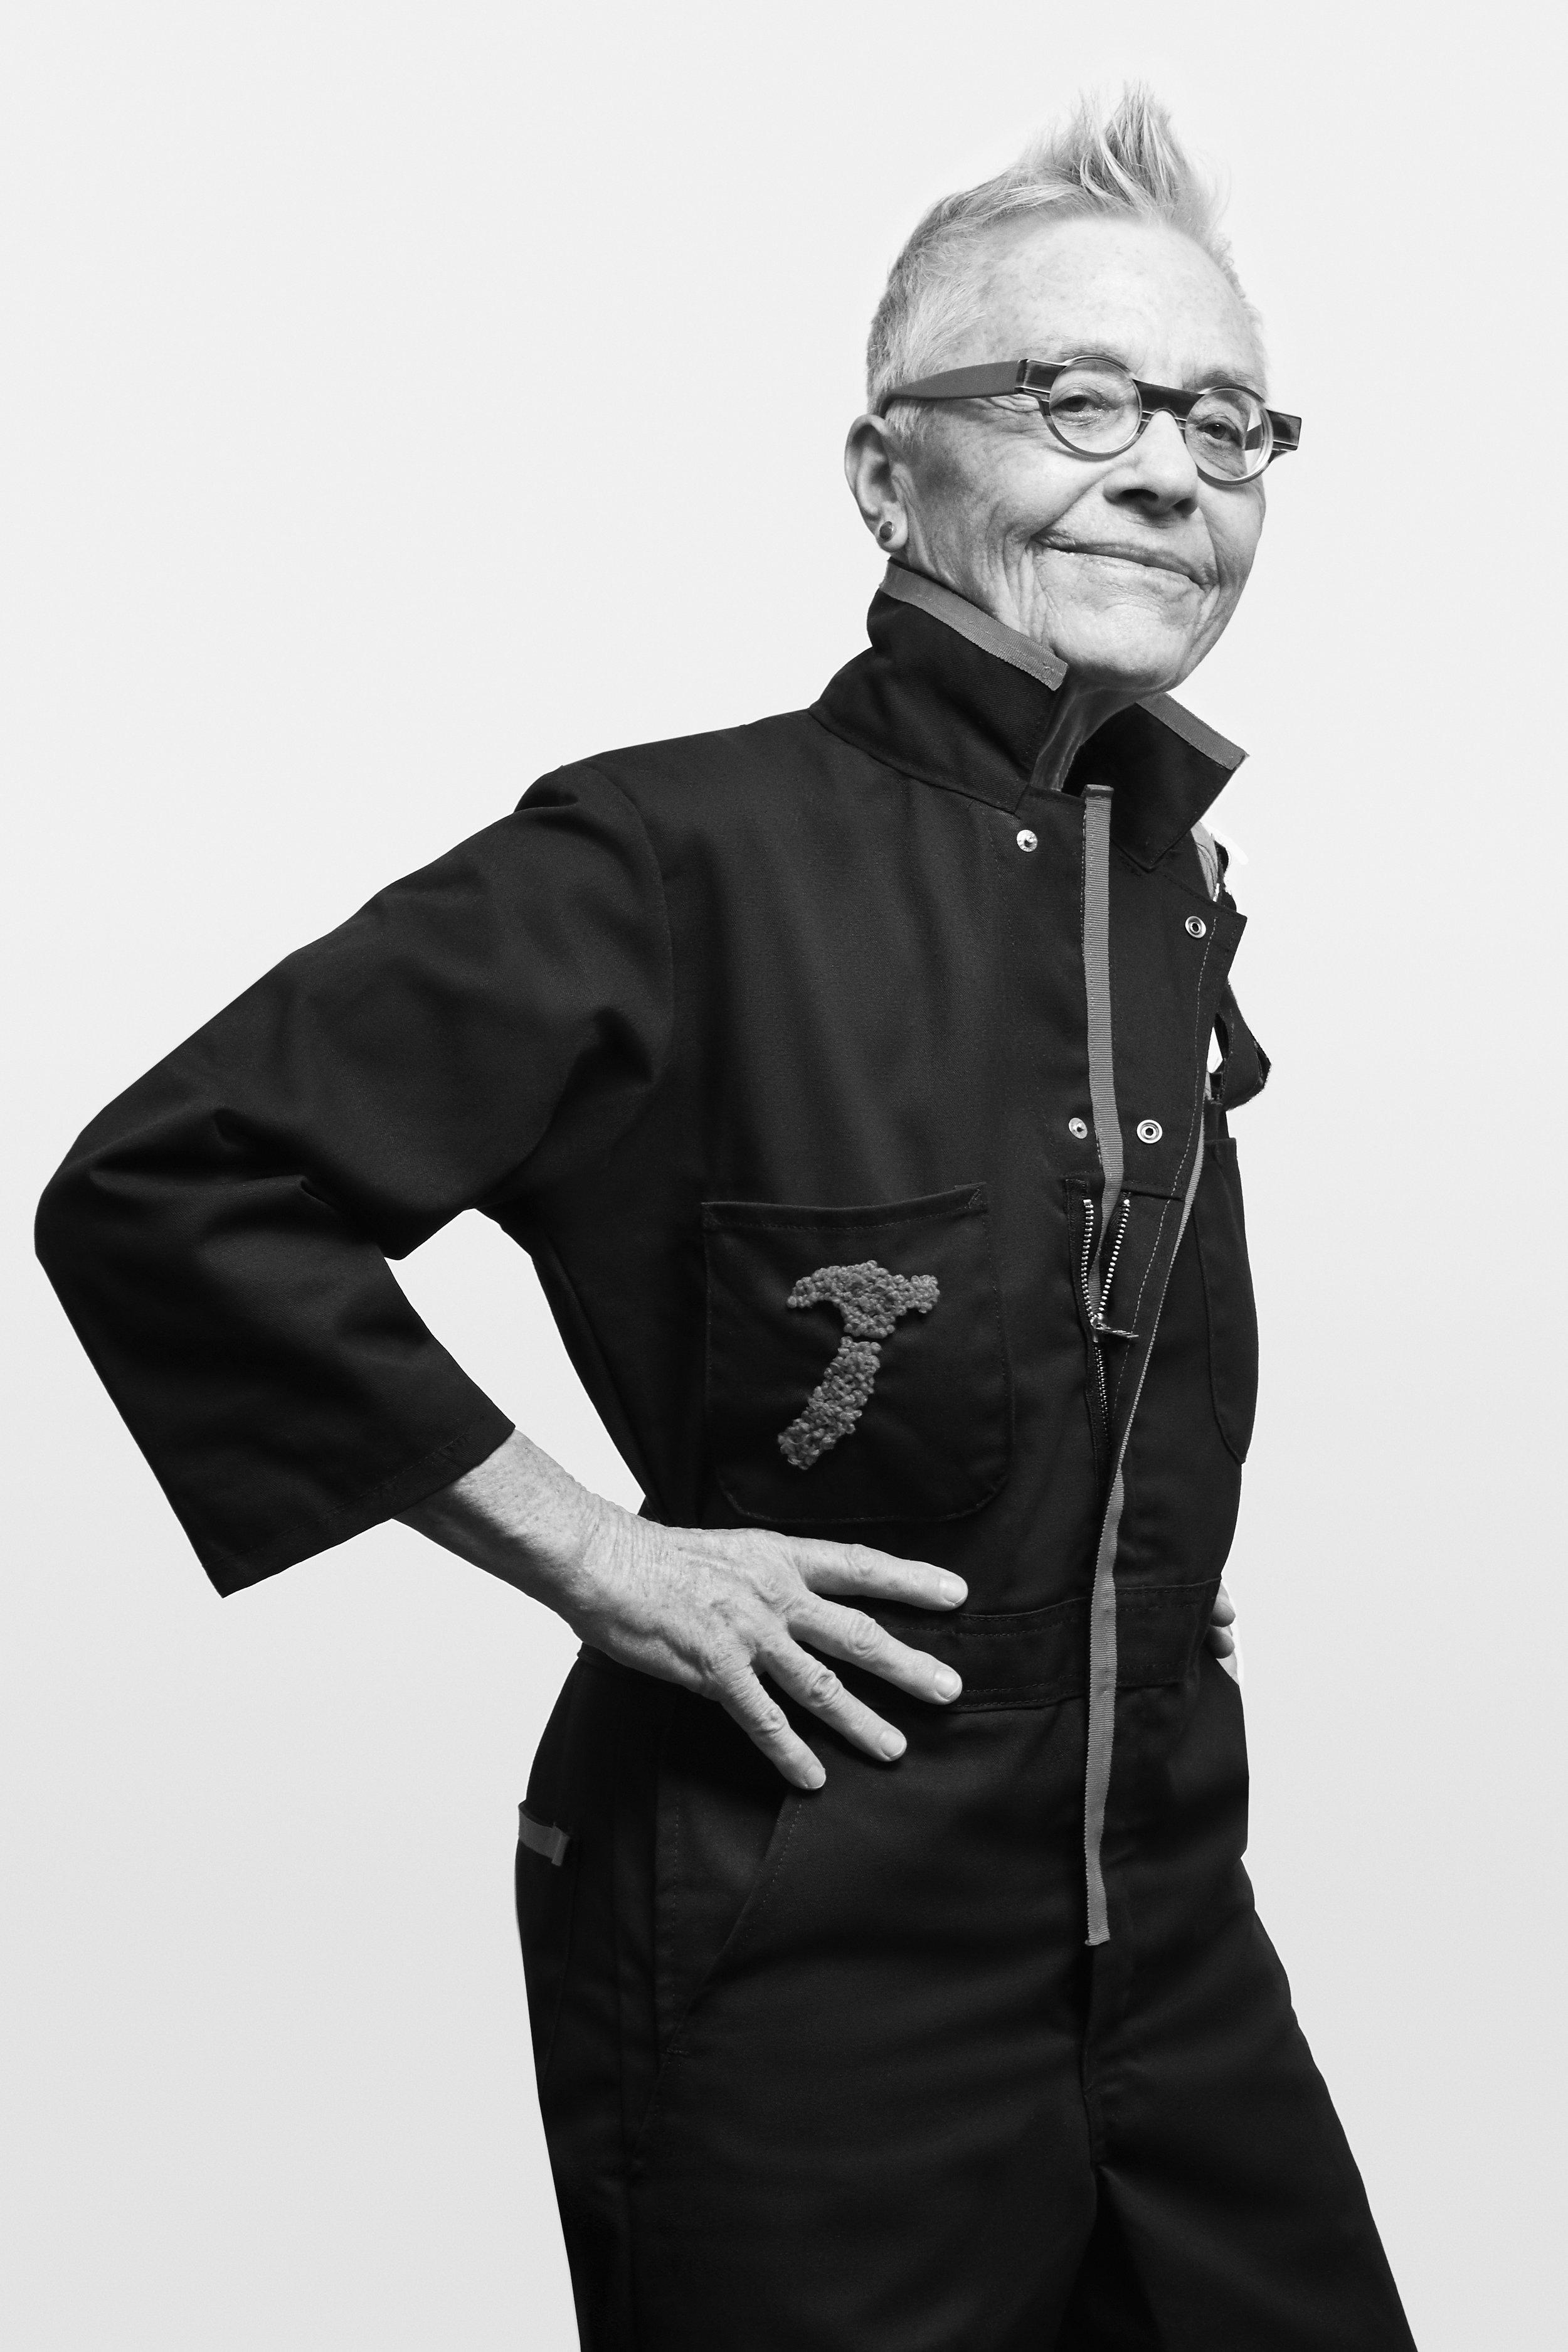 Image by Eric McNatt for the 2017 Queer|Art Community Portrait Portrait